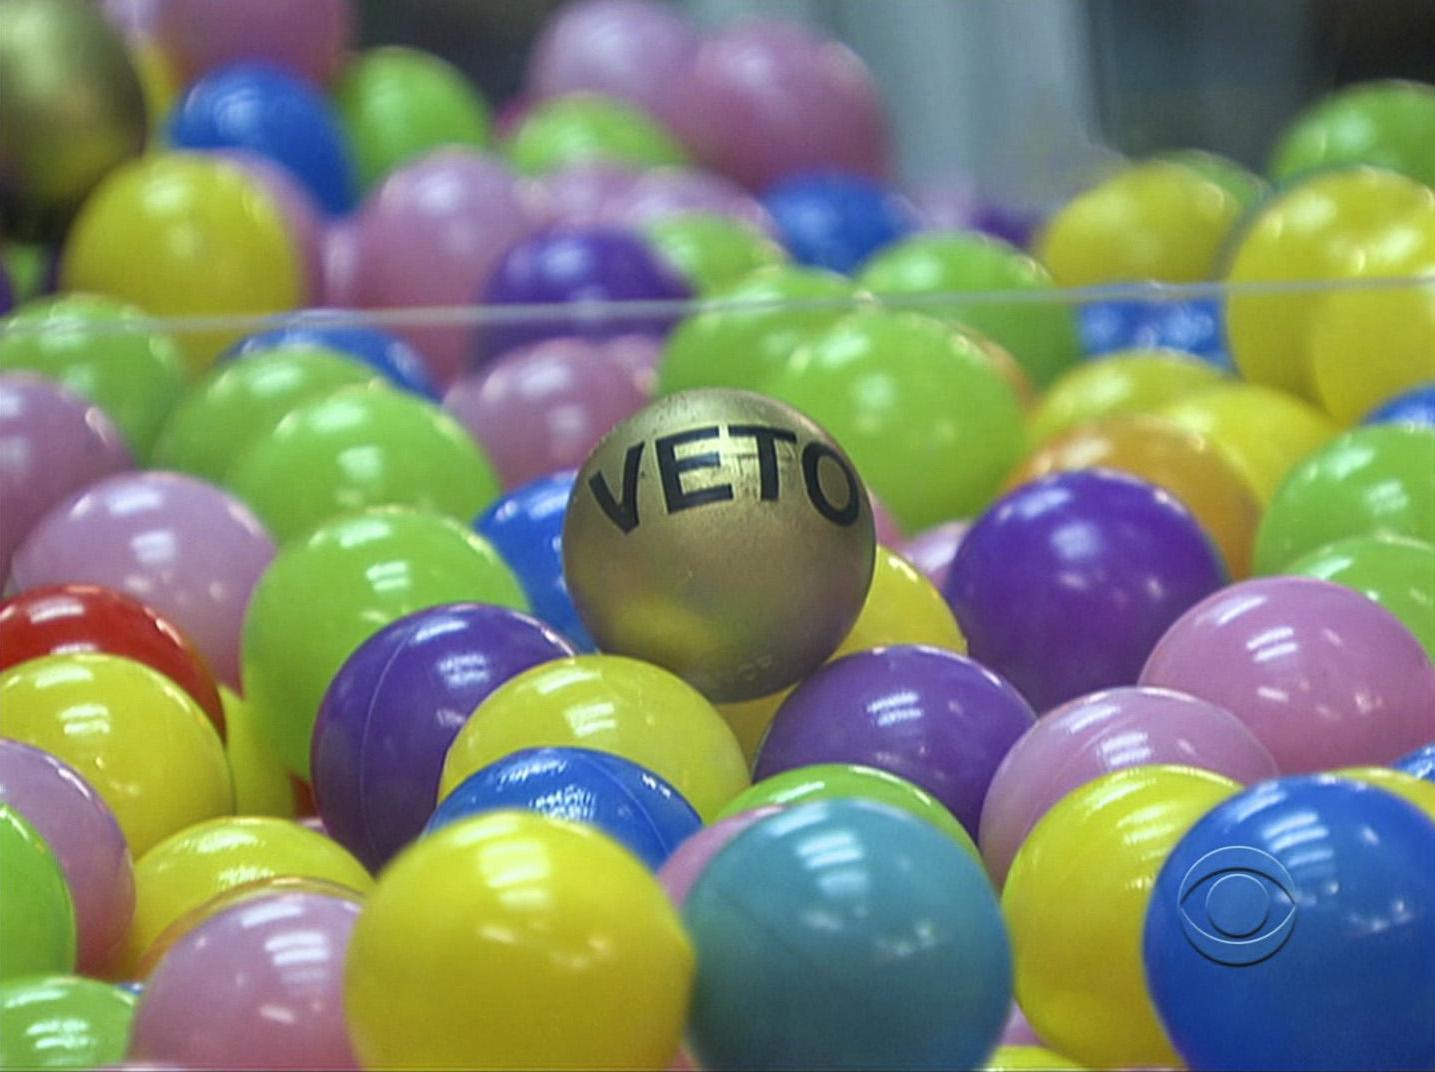 Second Veto